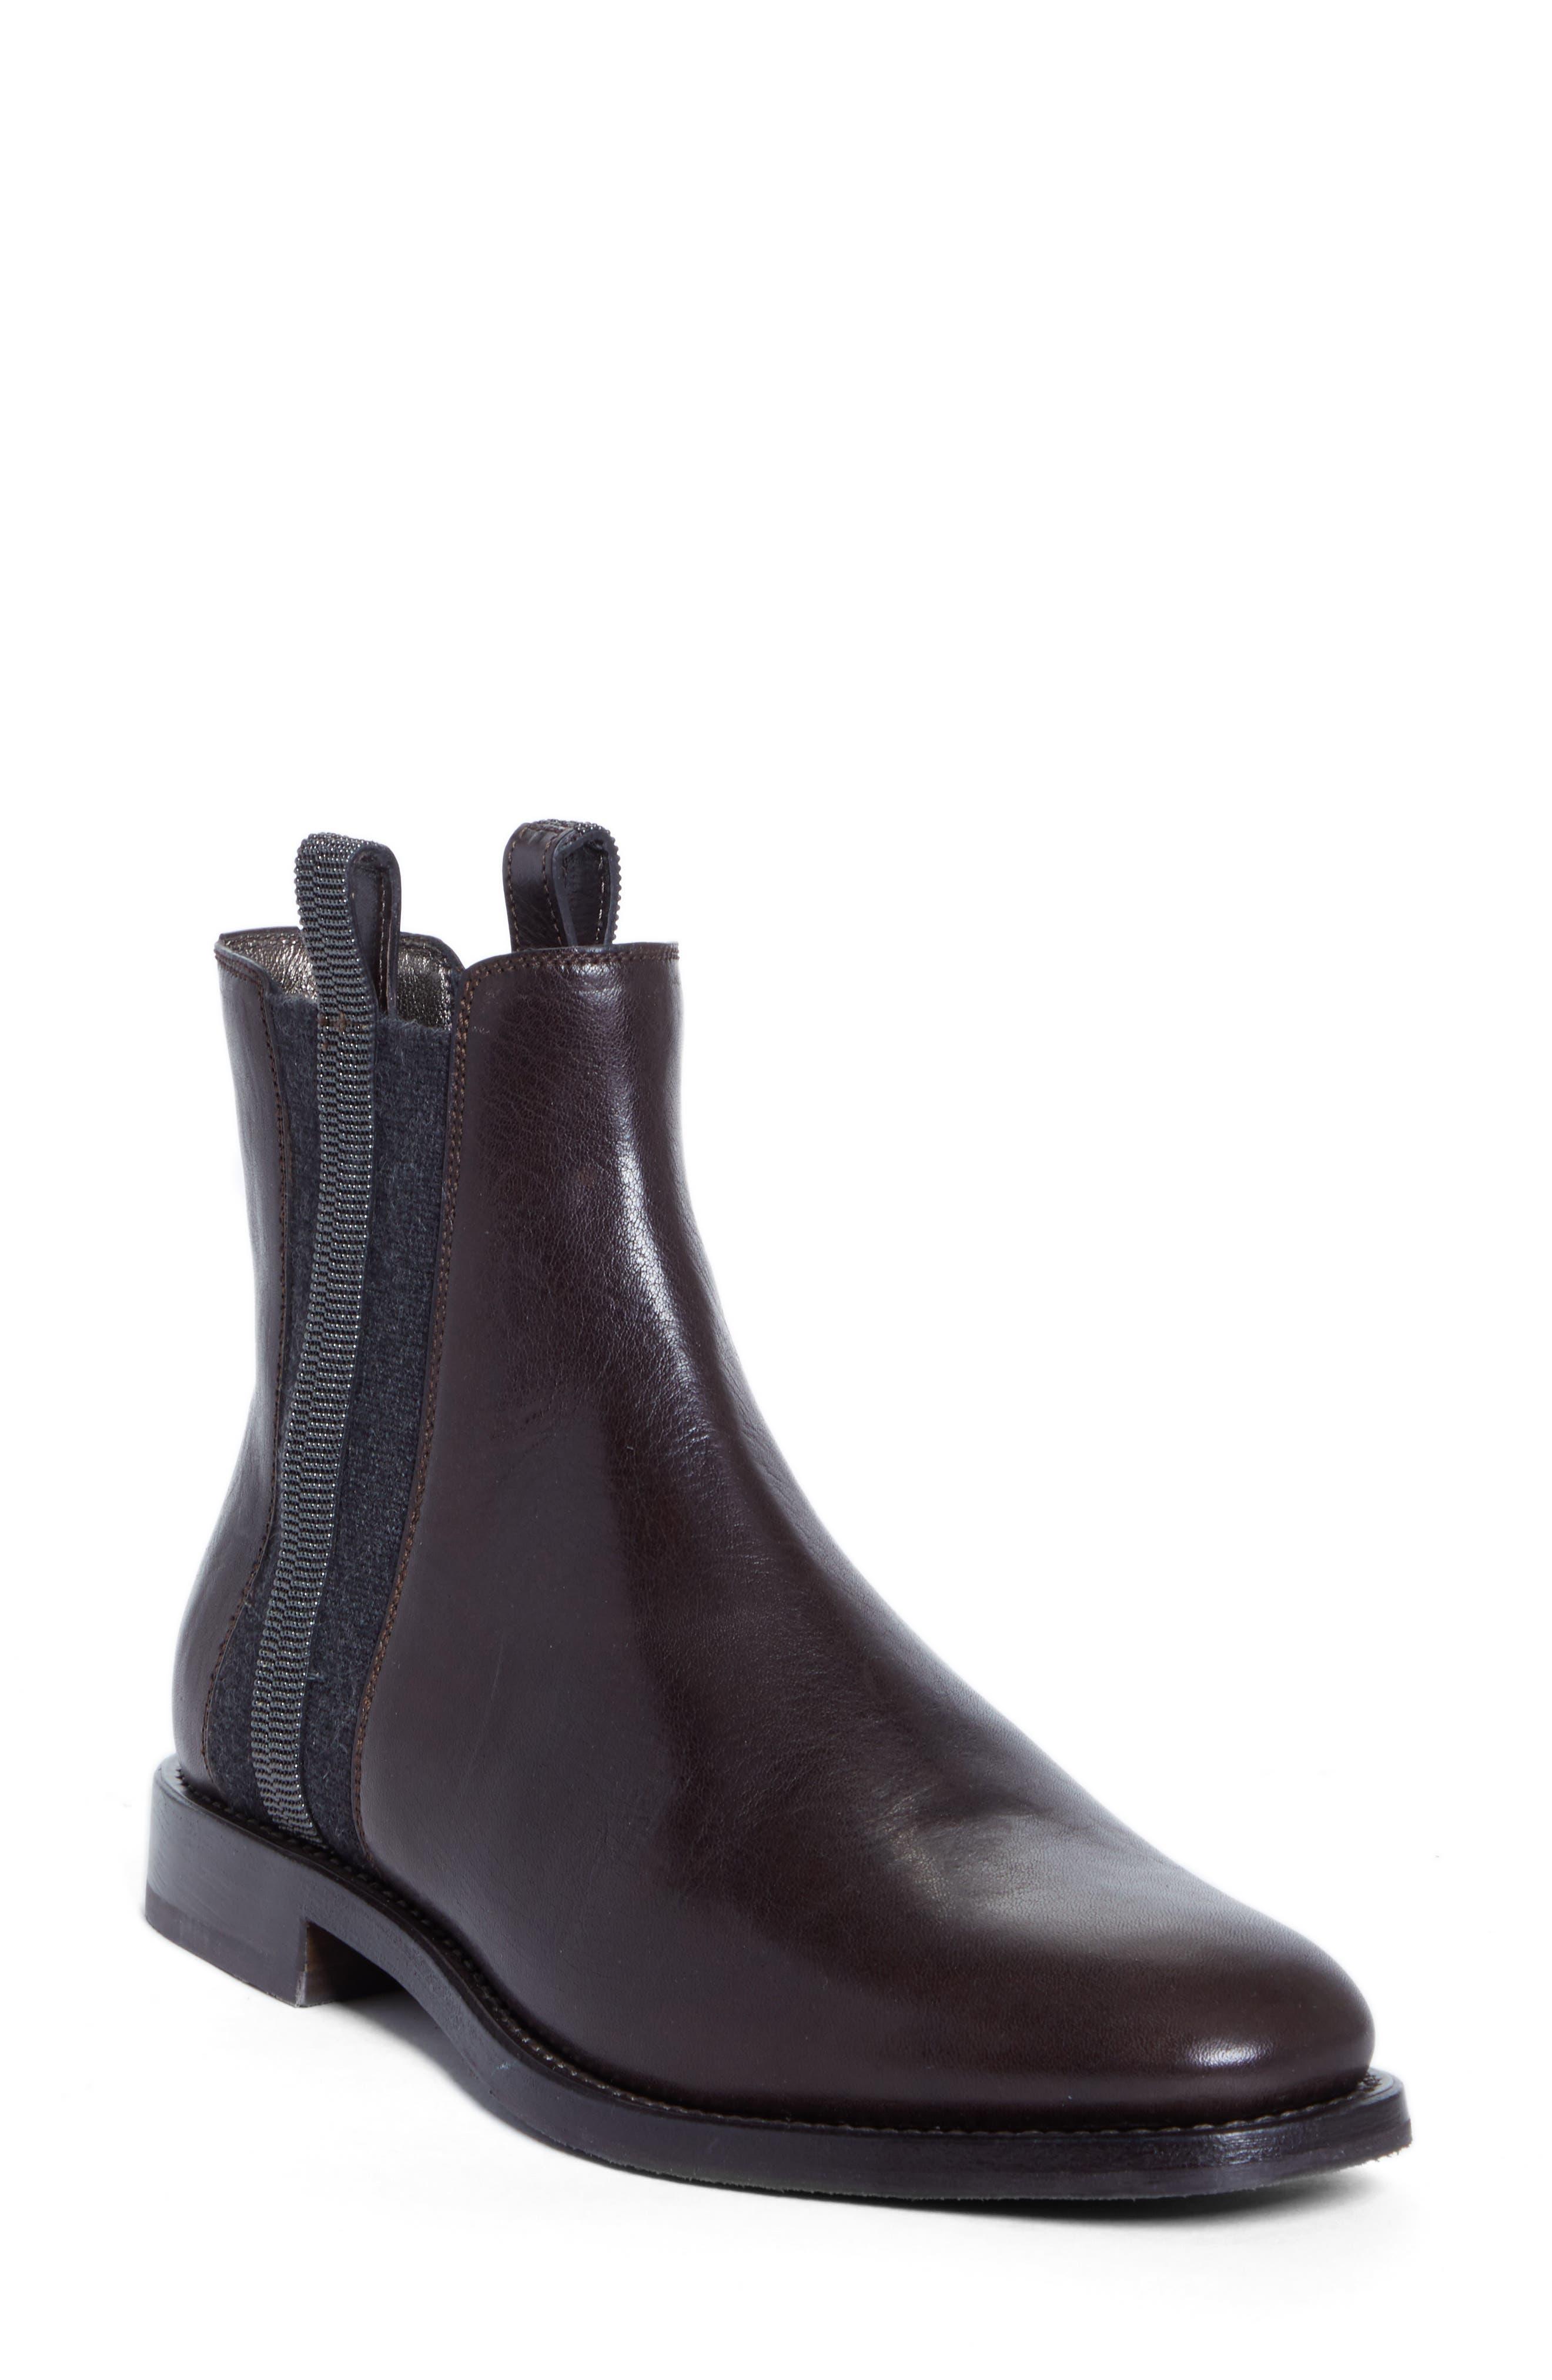 Brunello Cucinelli Boots Chelsea Boot